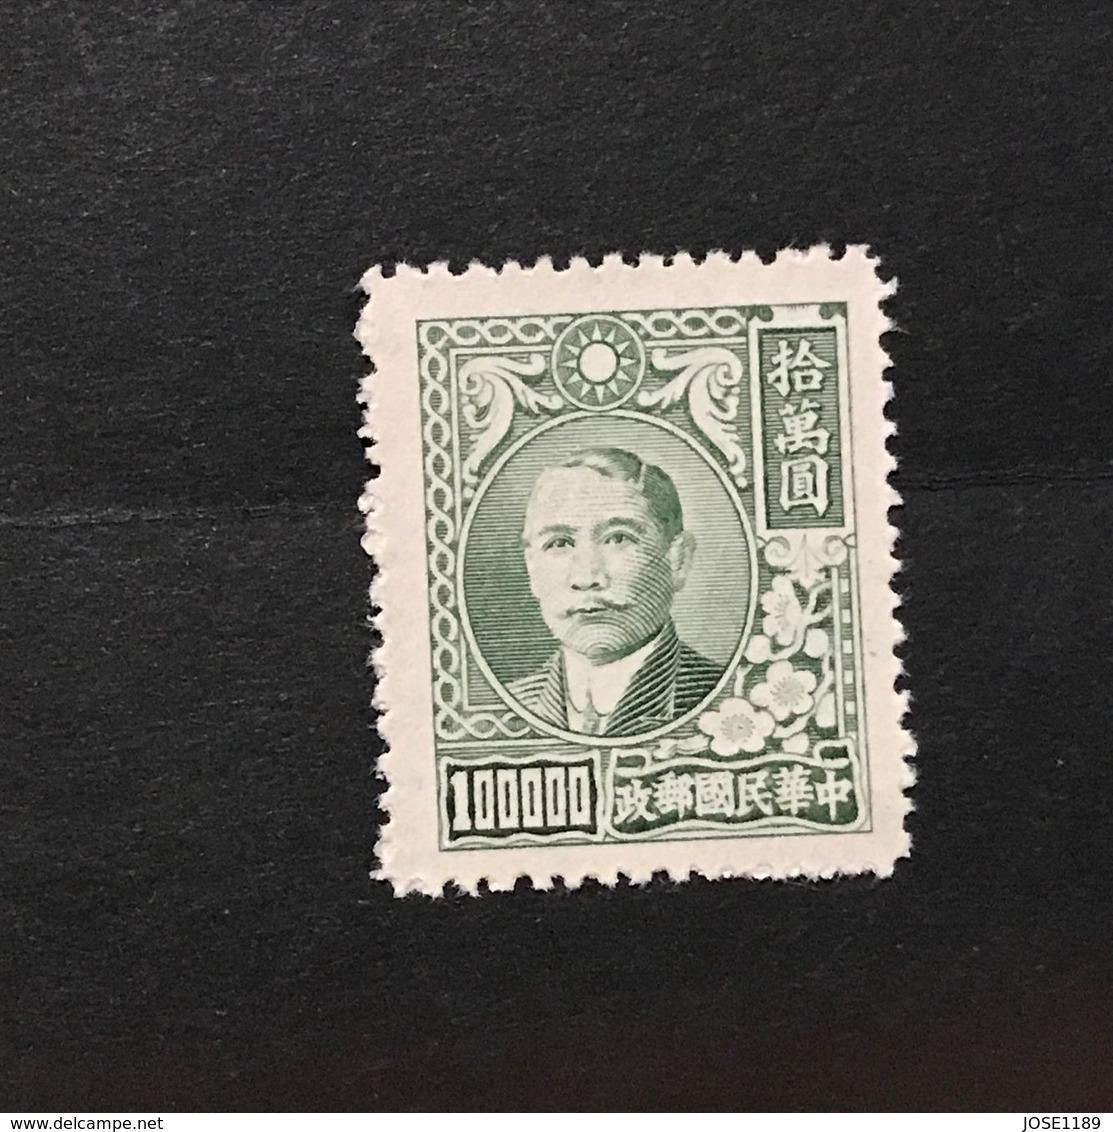 ◆◆◆ CHINA 1948  Dr. Sun Yat-Sen Issue  Third  Shanghai Dah Tung Print  $100,000  NEW  AA719 - Chine